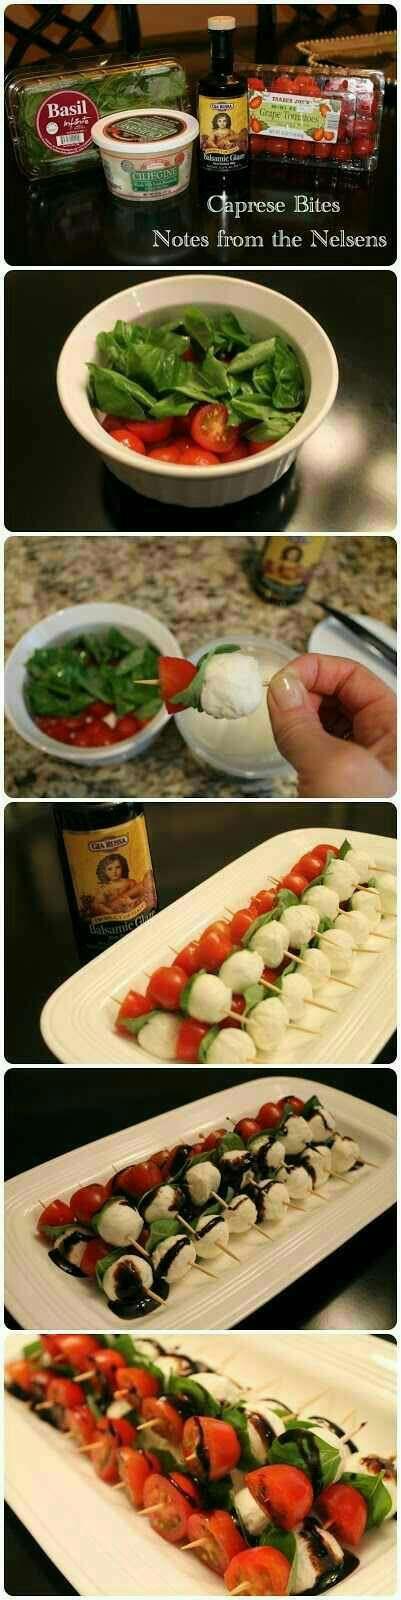 the perfect appetizer#Food&Drink#Trusper#Tip